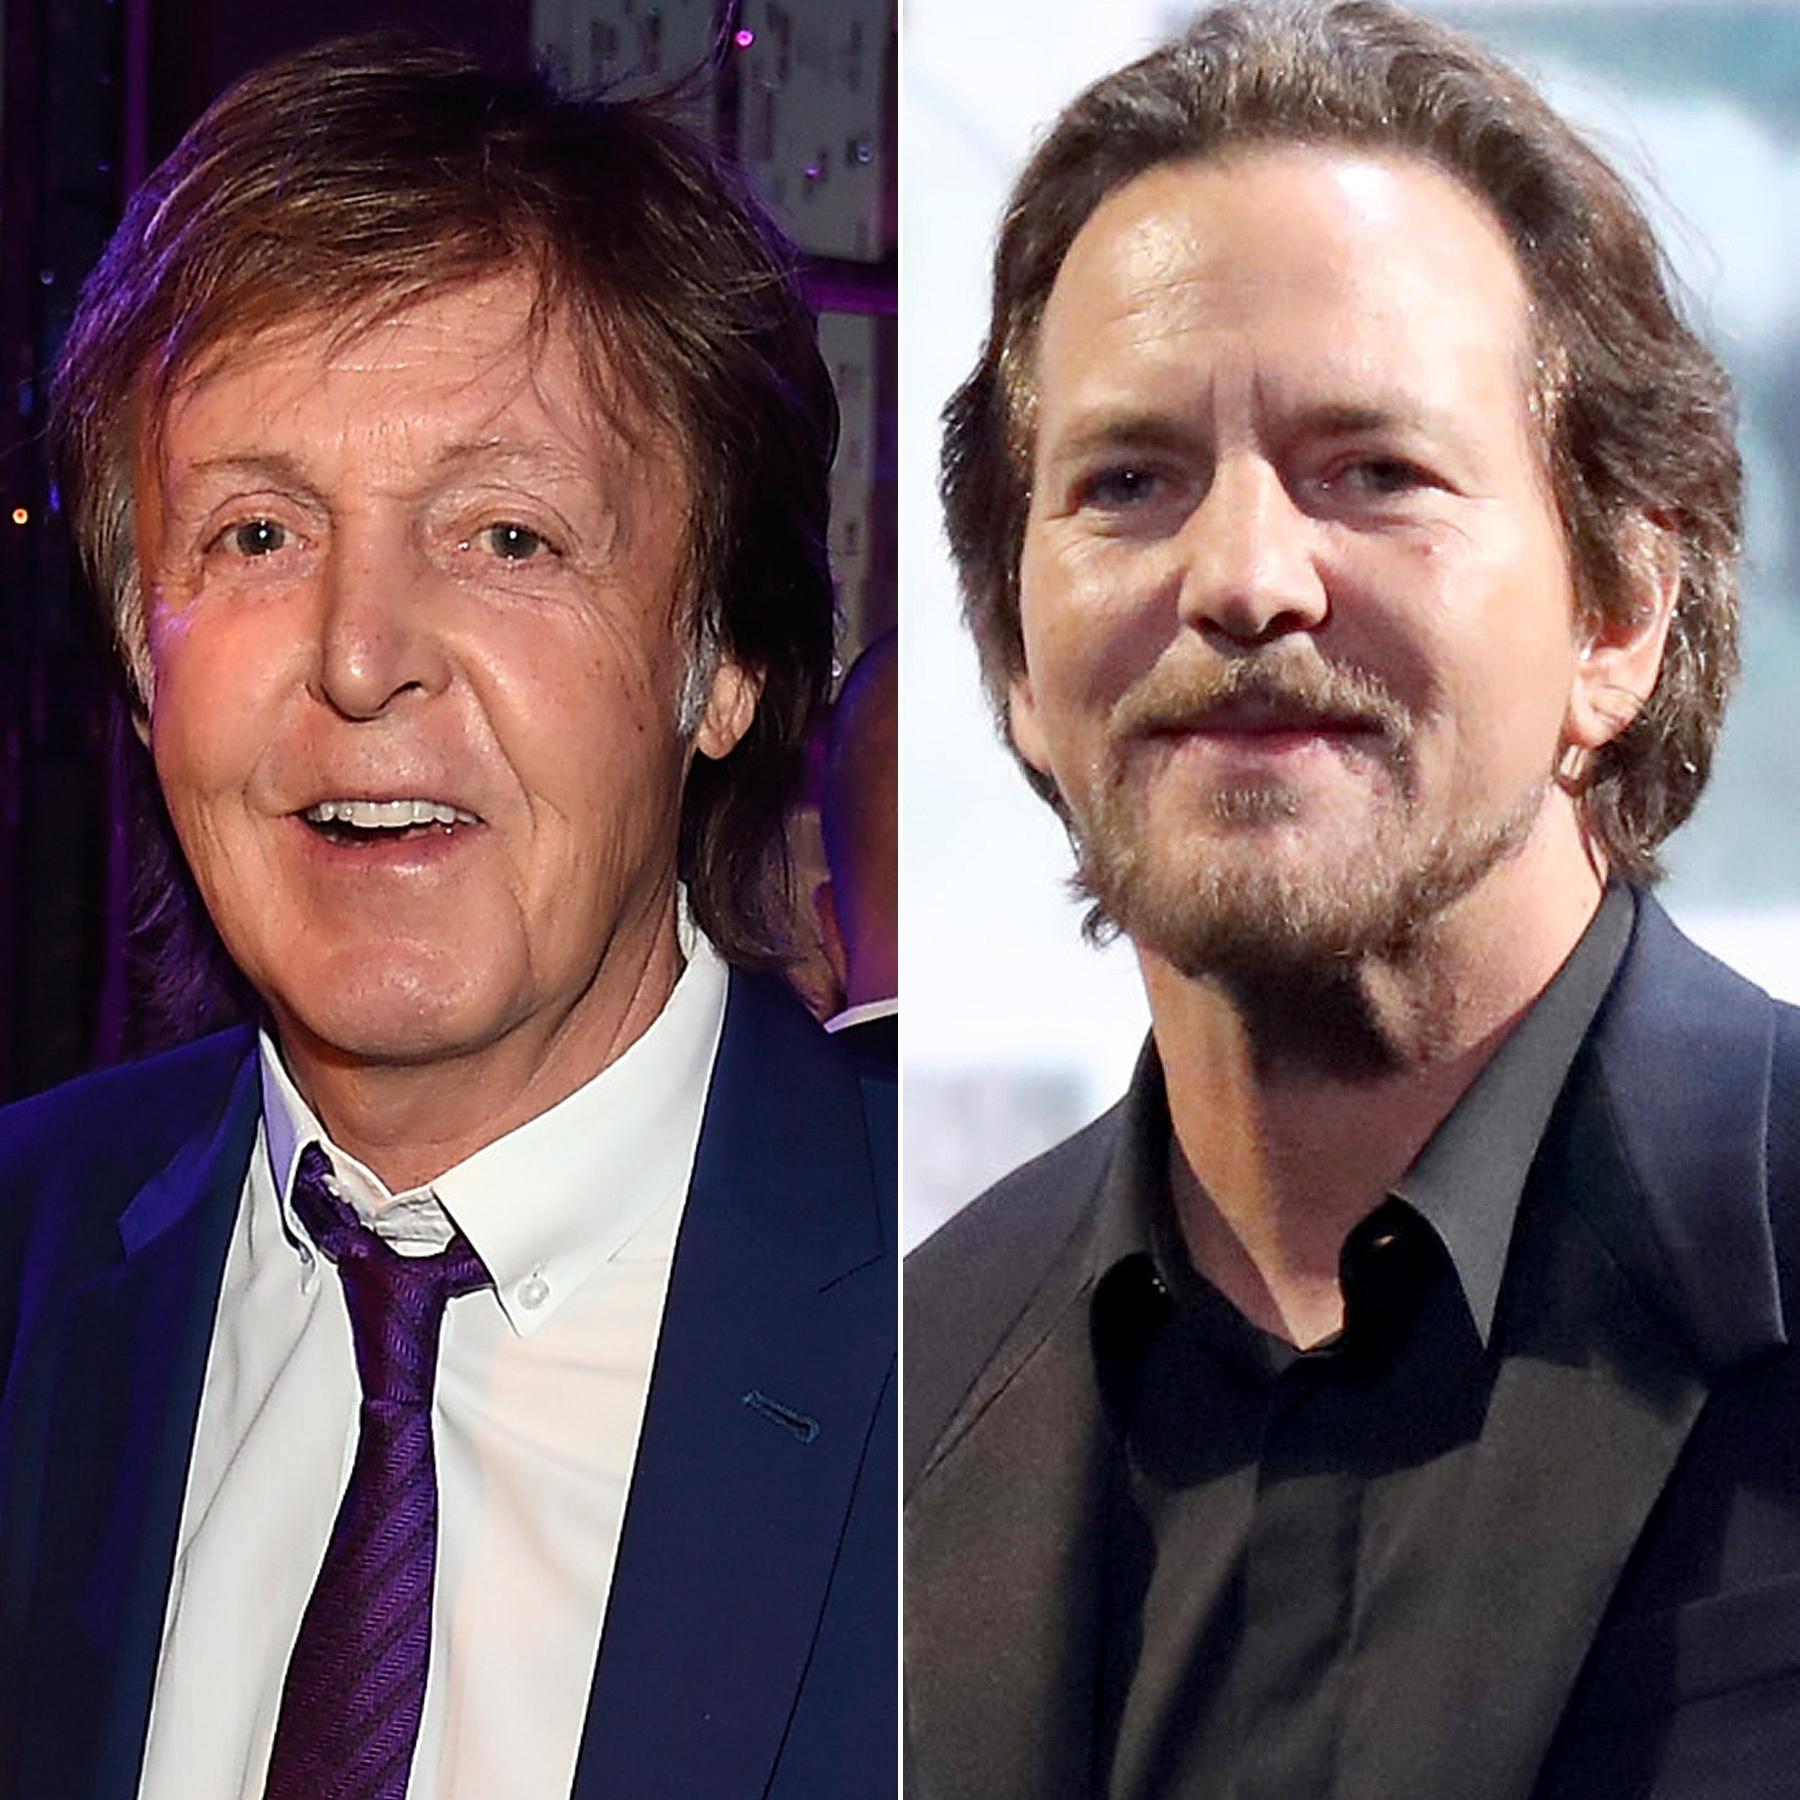 Paul McCartney punched Eddie Vedder